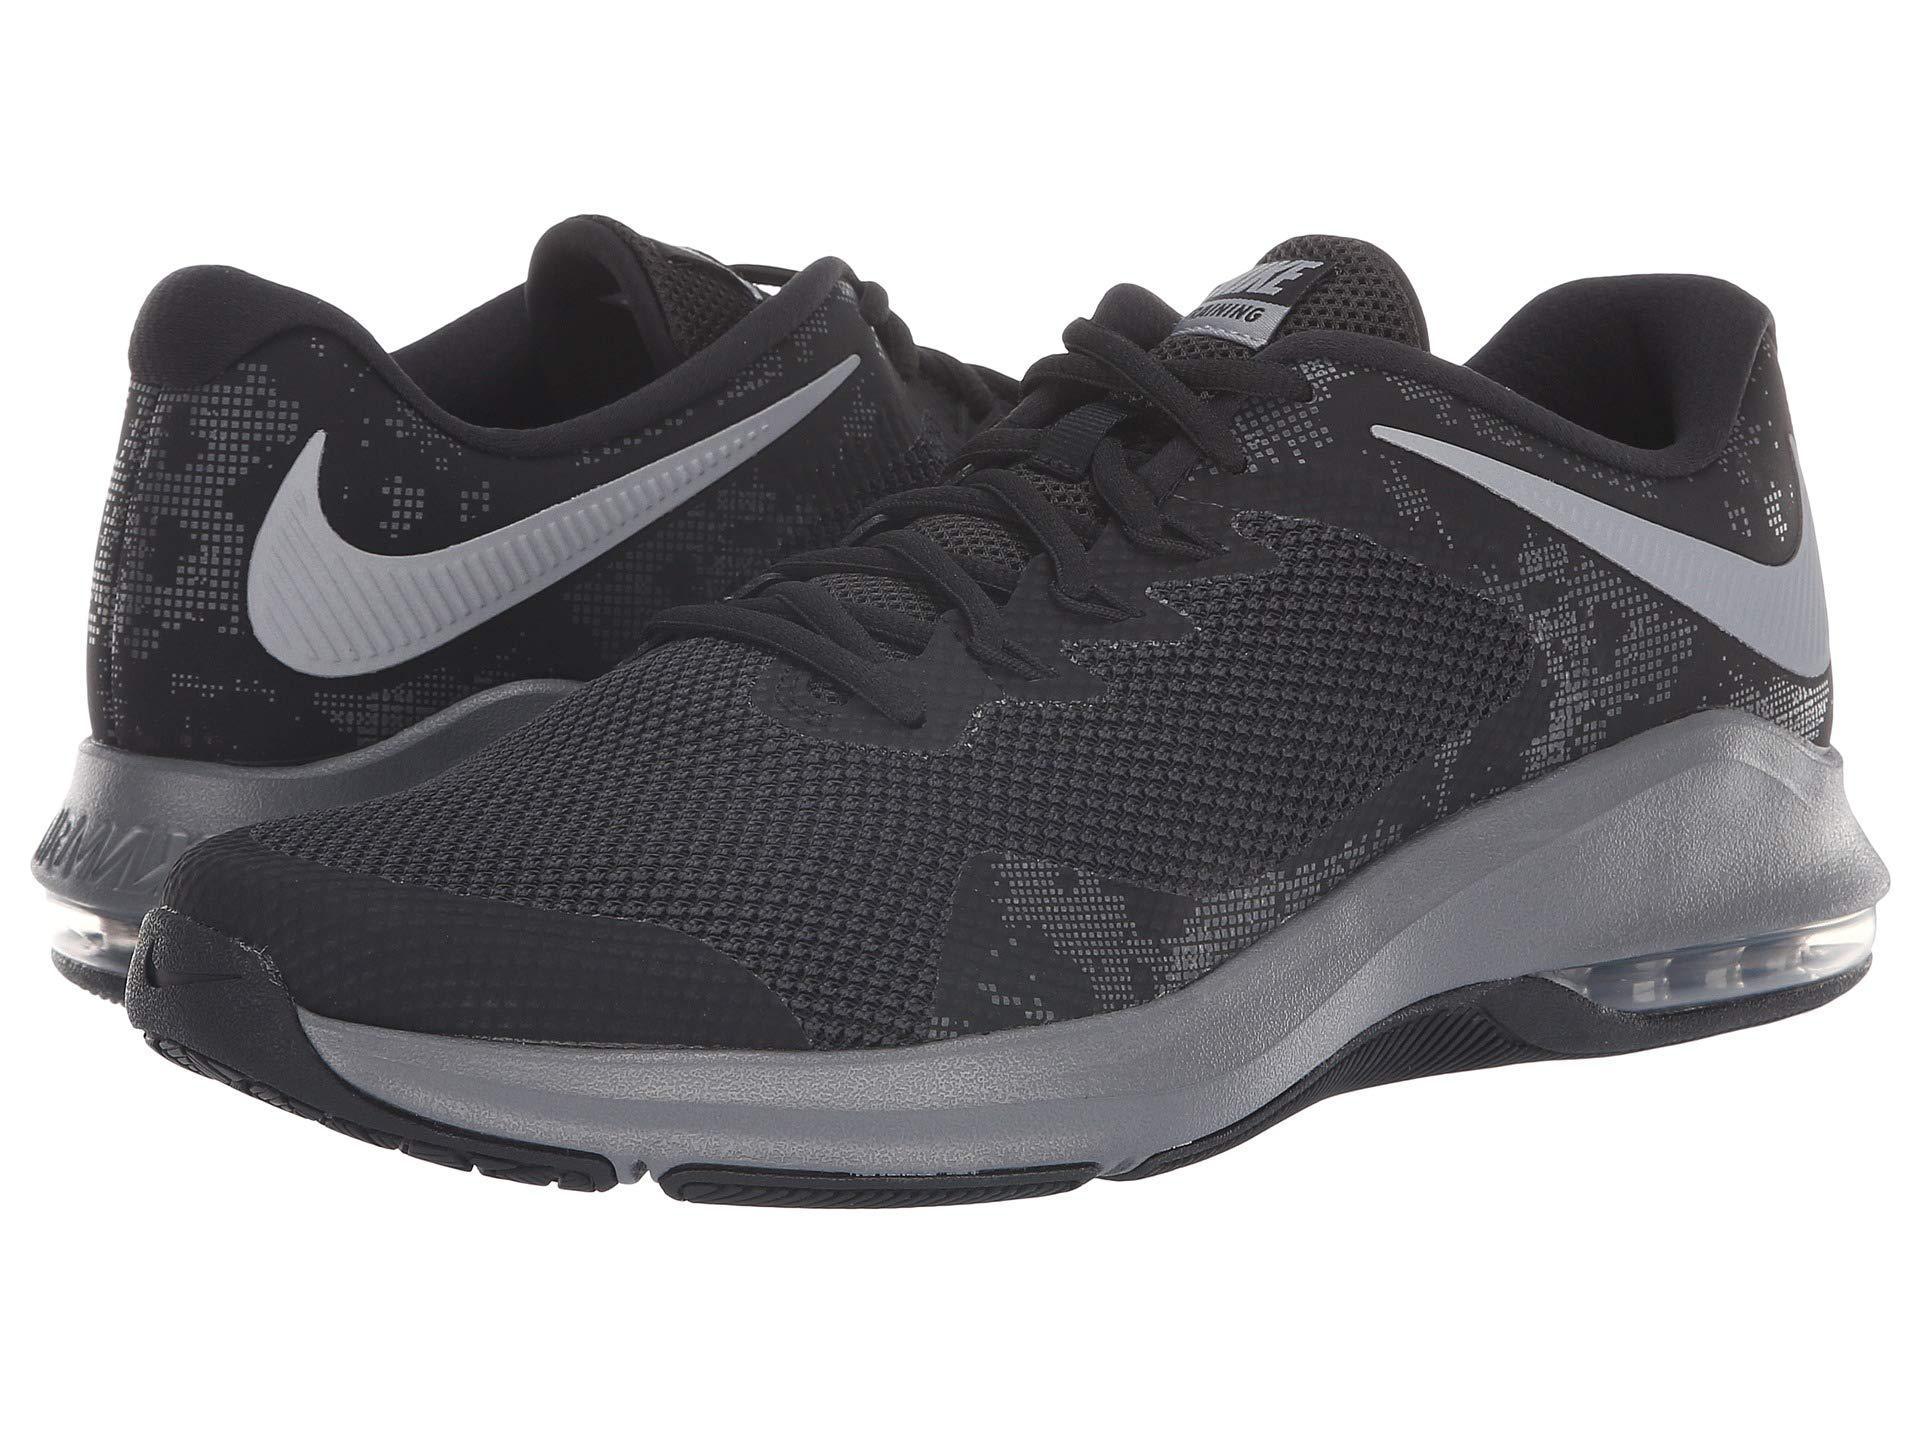 fcbed75666 Nike Air Max Alpha Trainer (cool Grey/black) Men's Cross Training ...